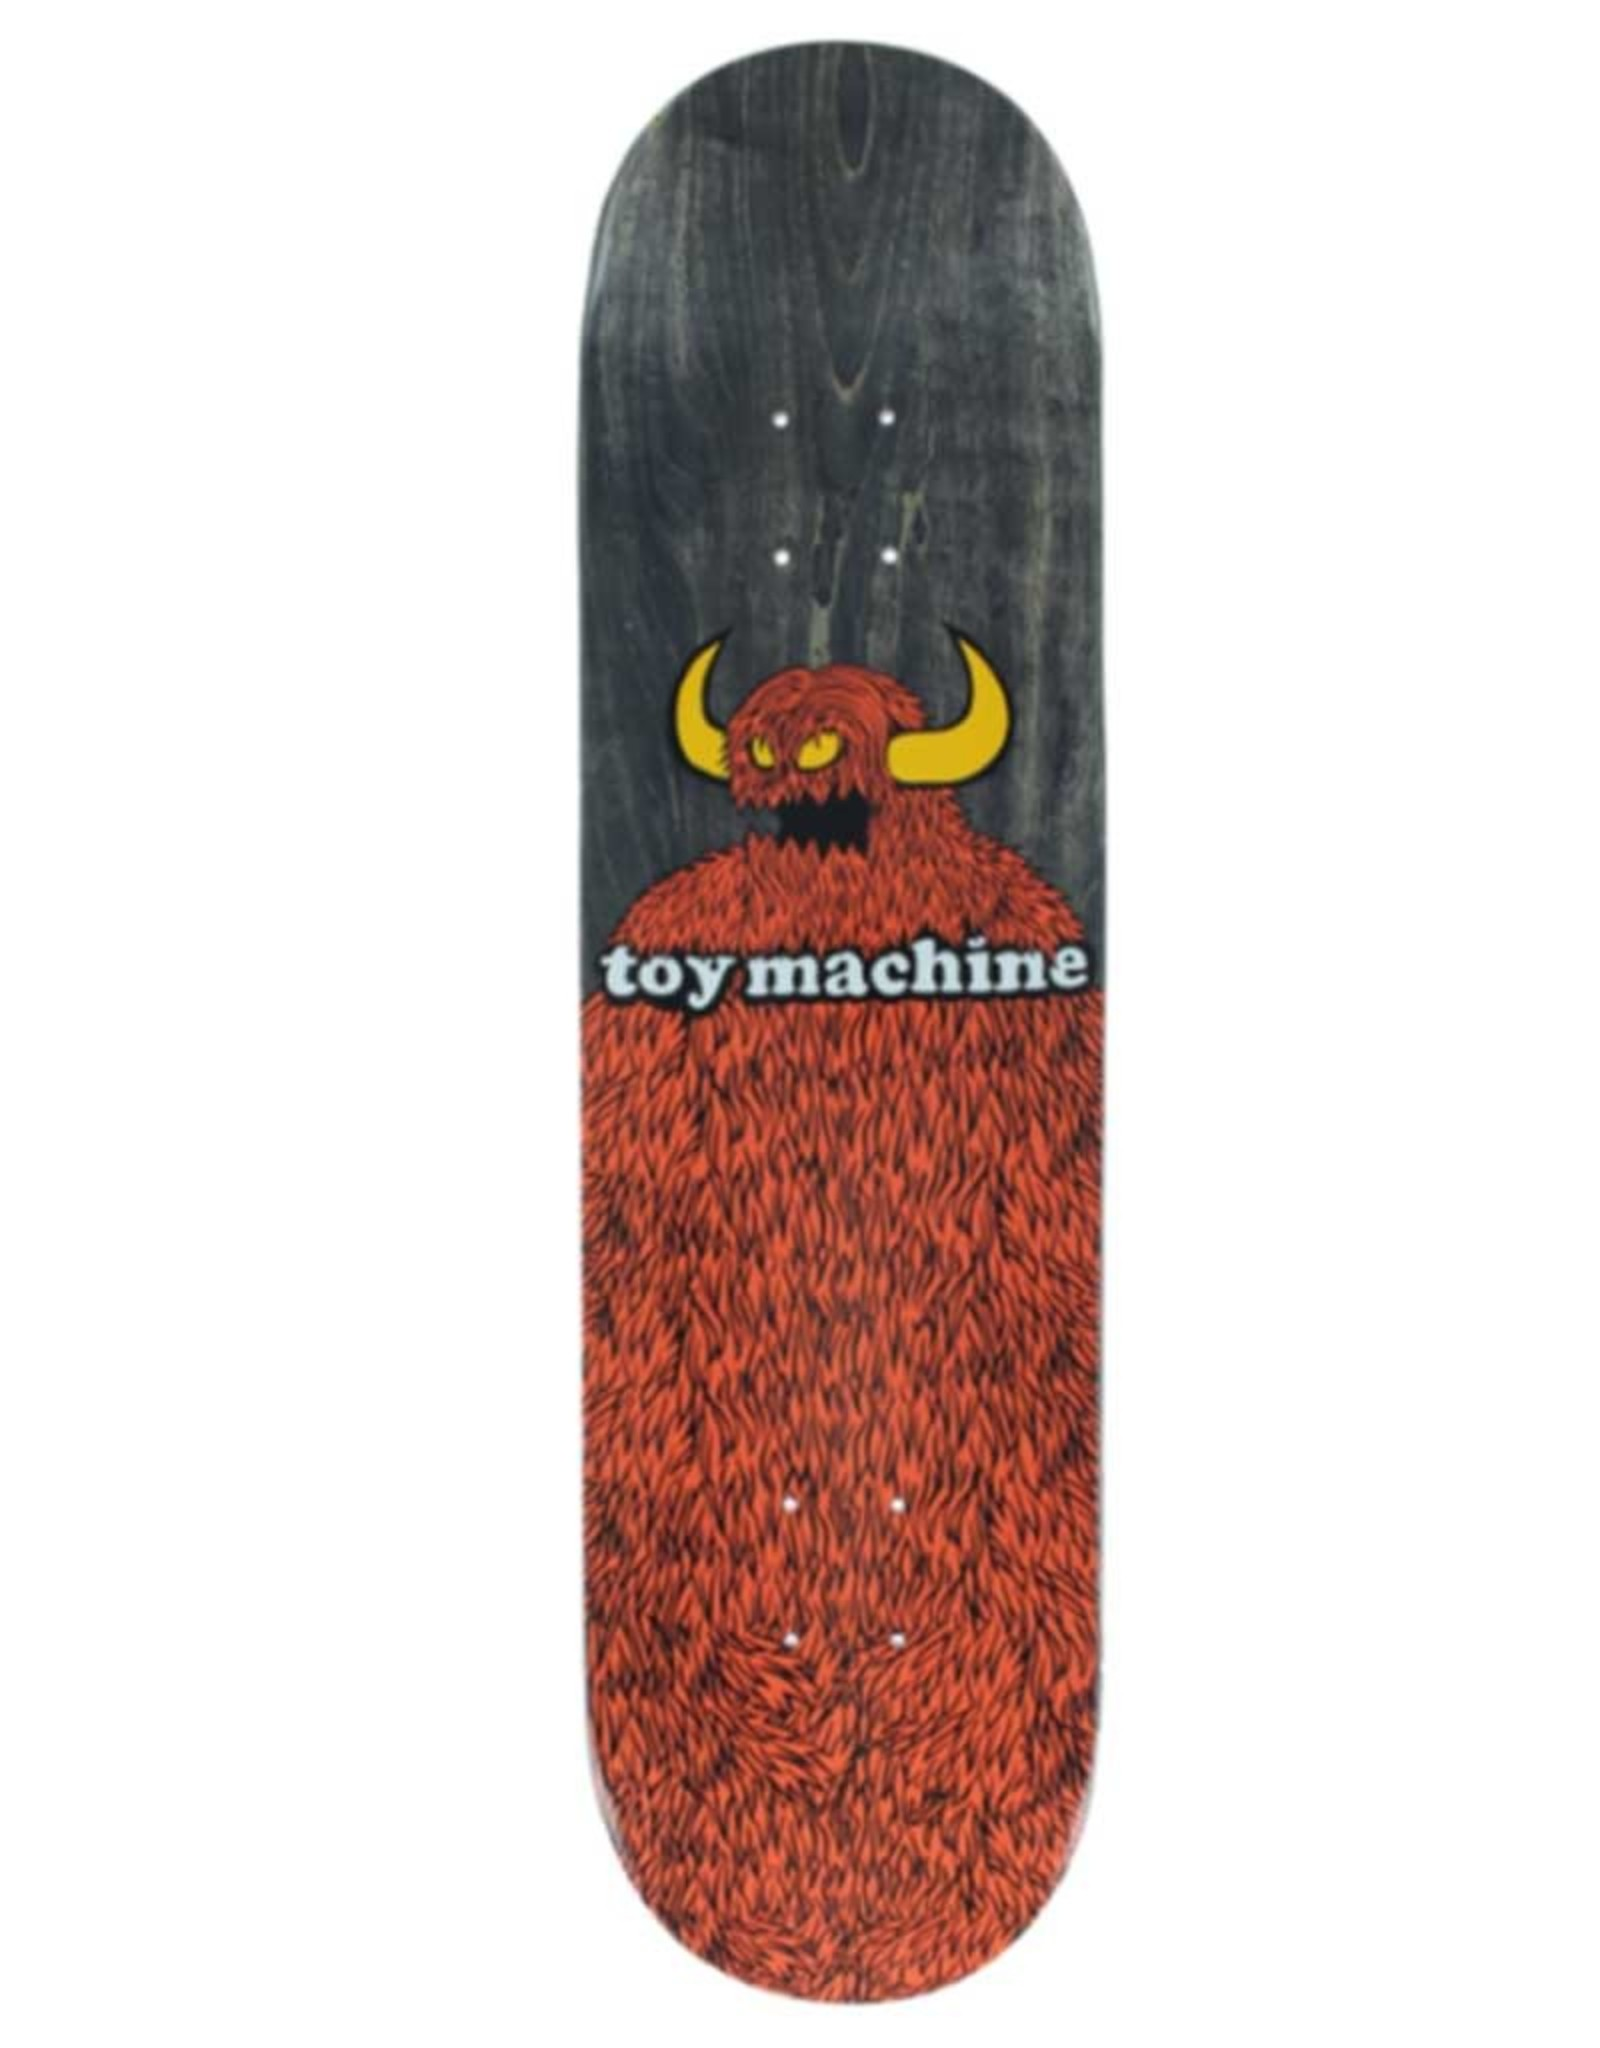 "Toy Machine Toy Machine Furry Monster 8.0"""